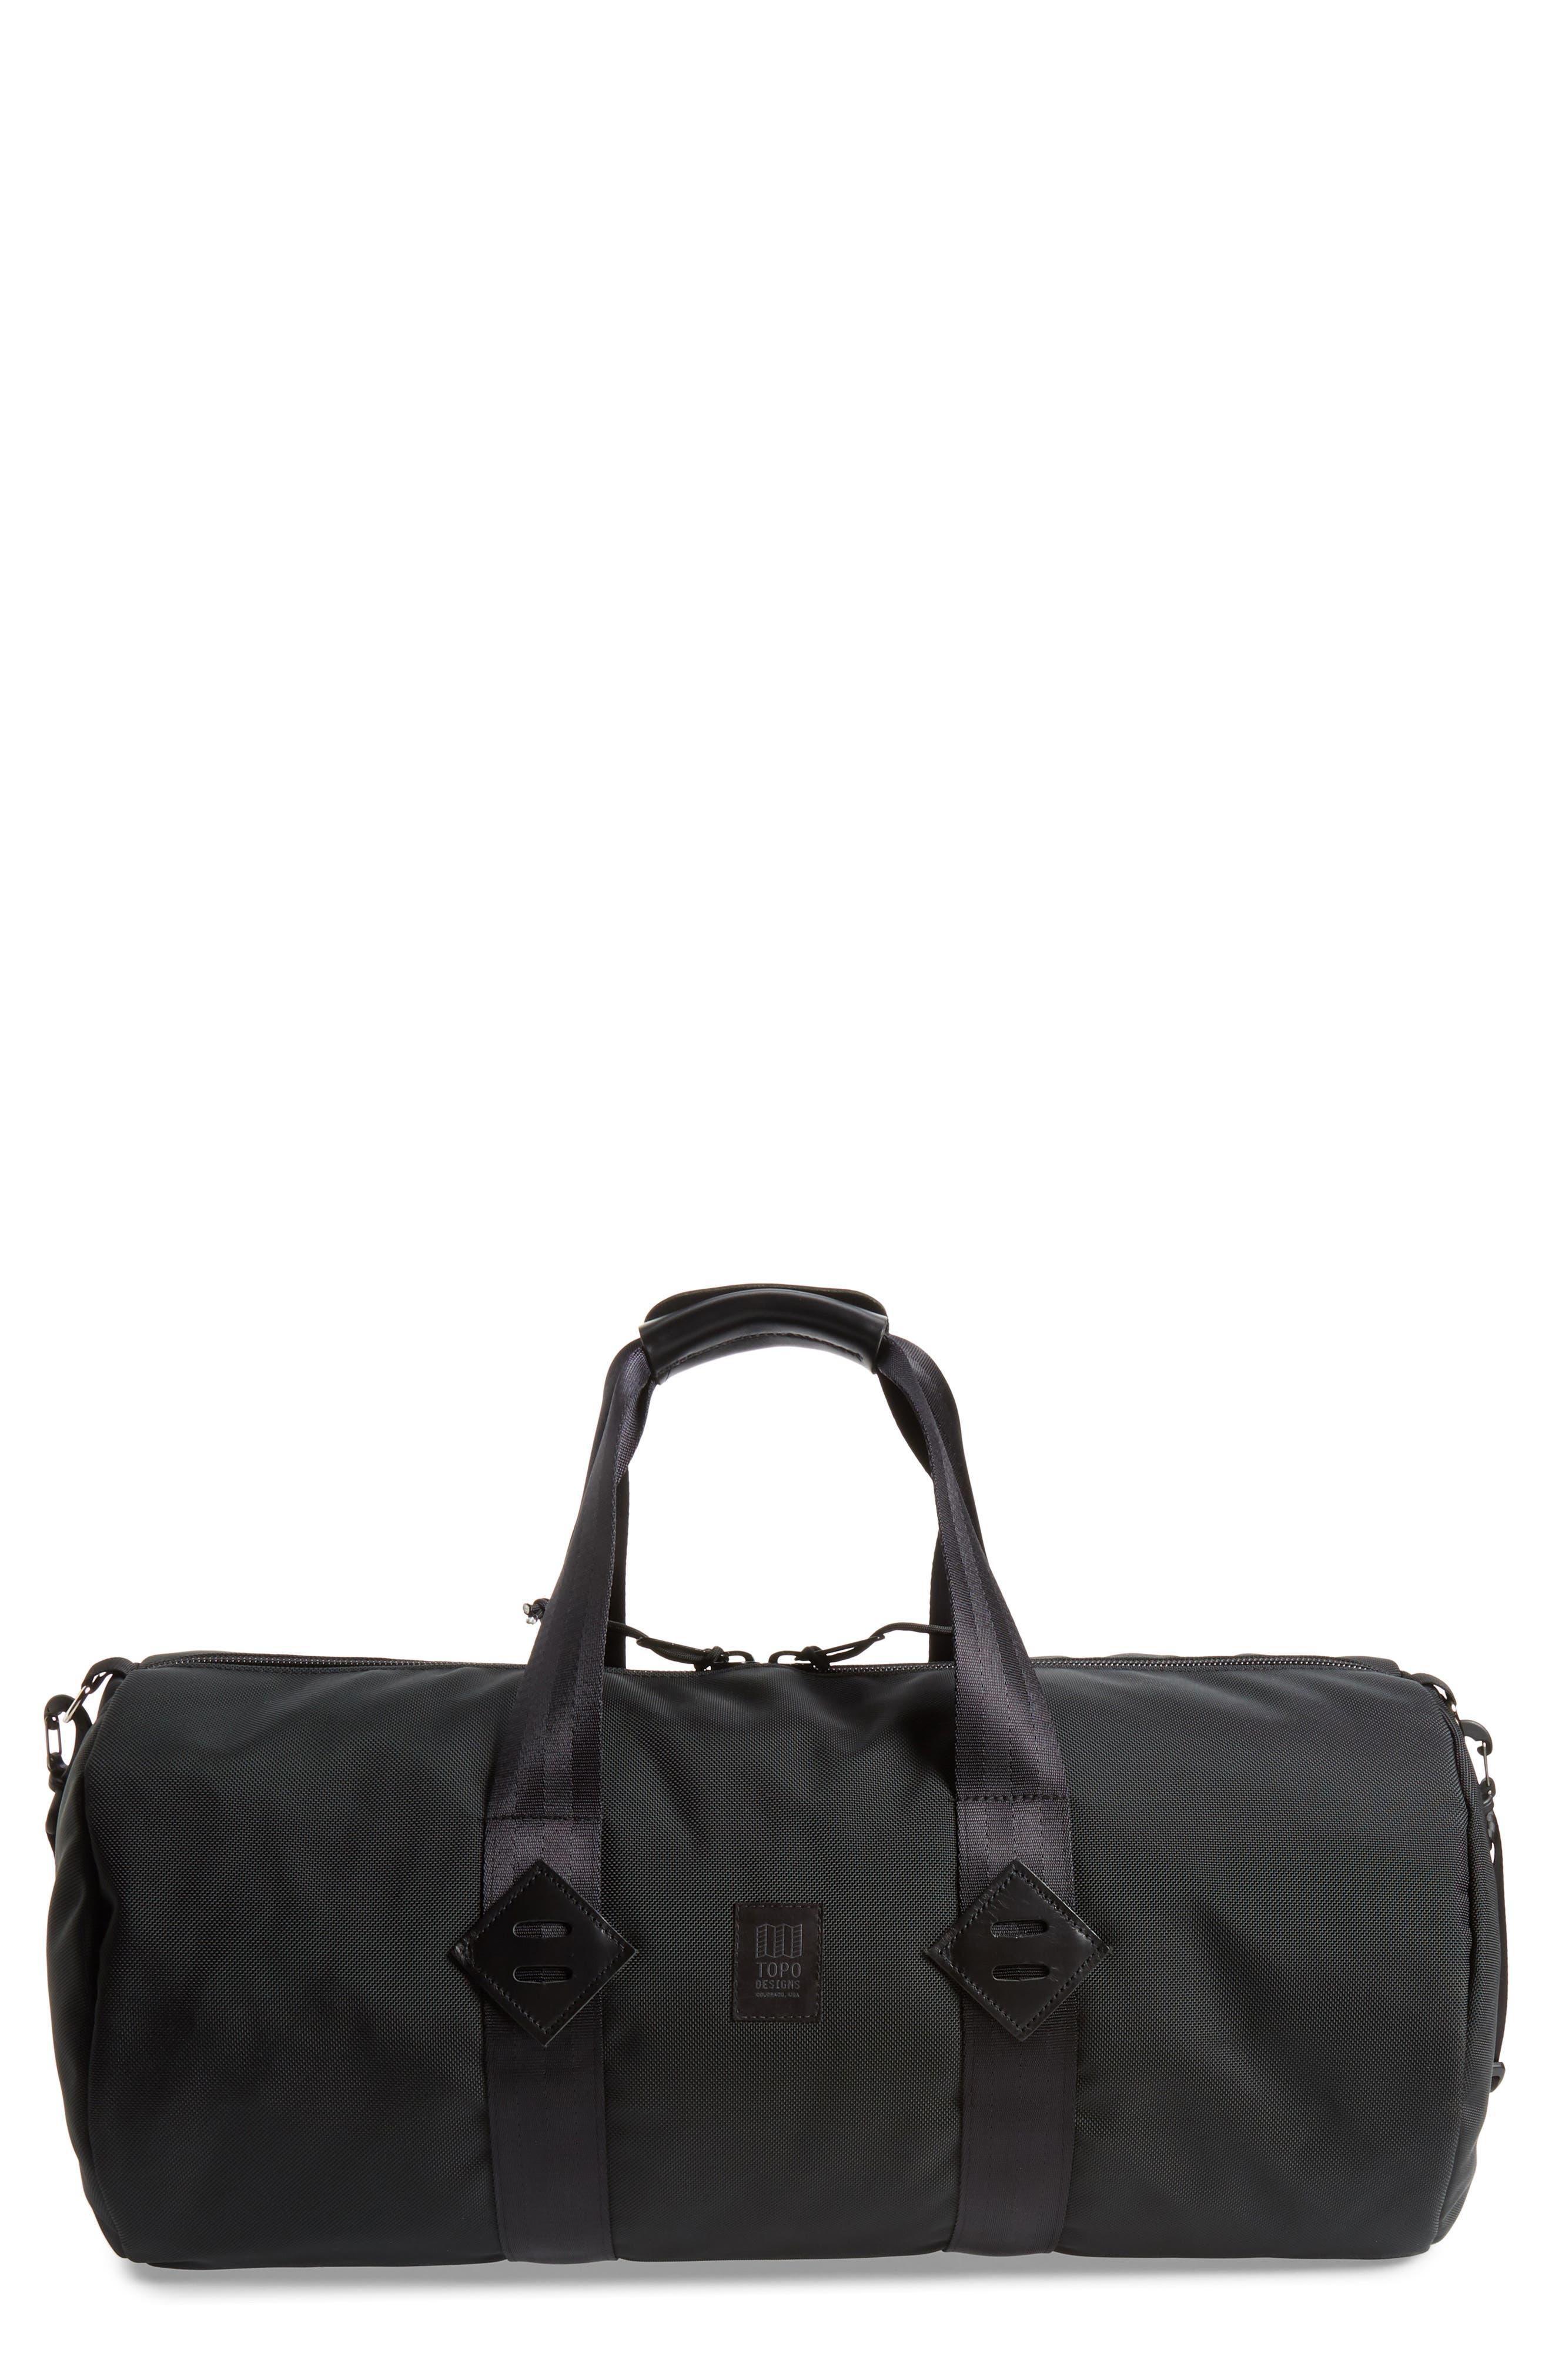 TOPO DESIGNS, Classic Duffle Bag, Main thumbnail 1, color, BALLISTIC BLACK/ BLACK LEATHER